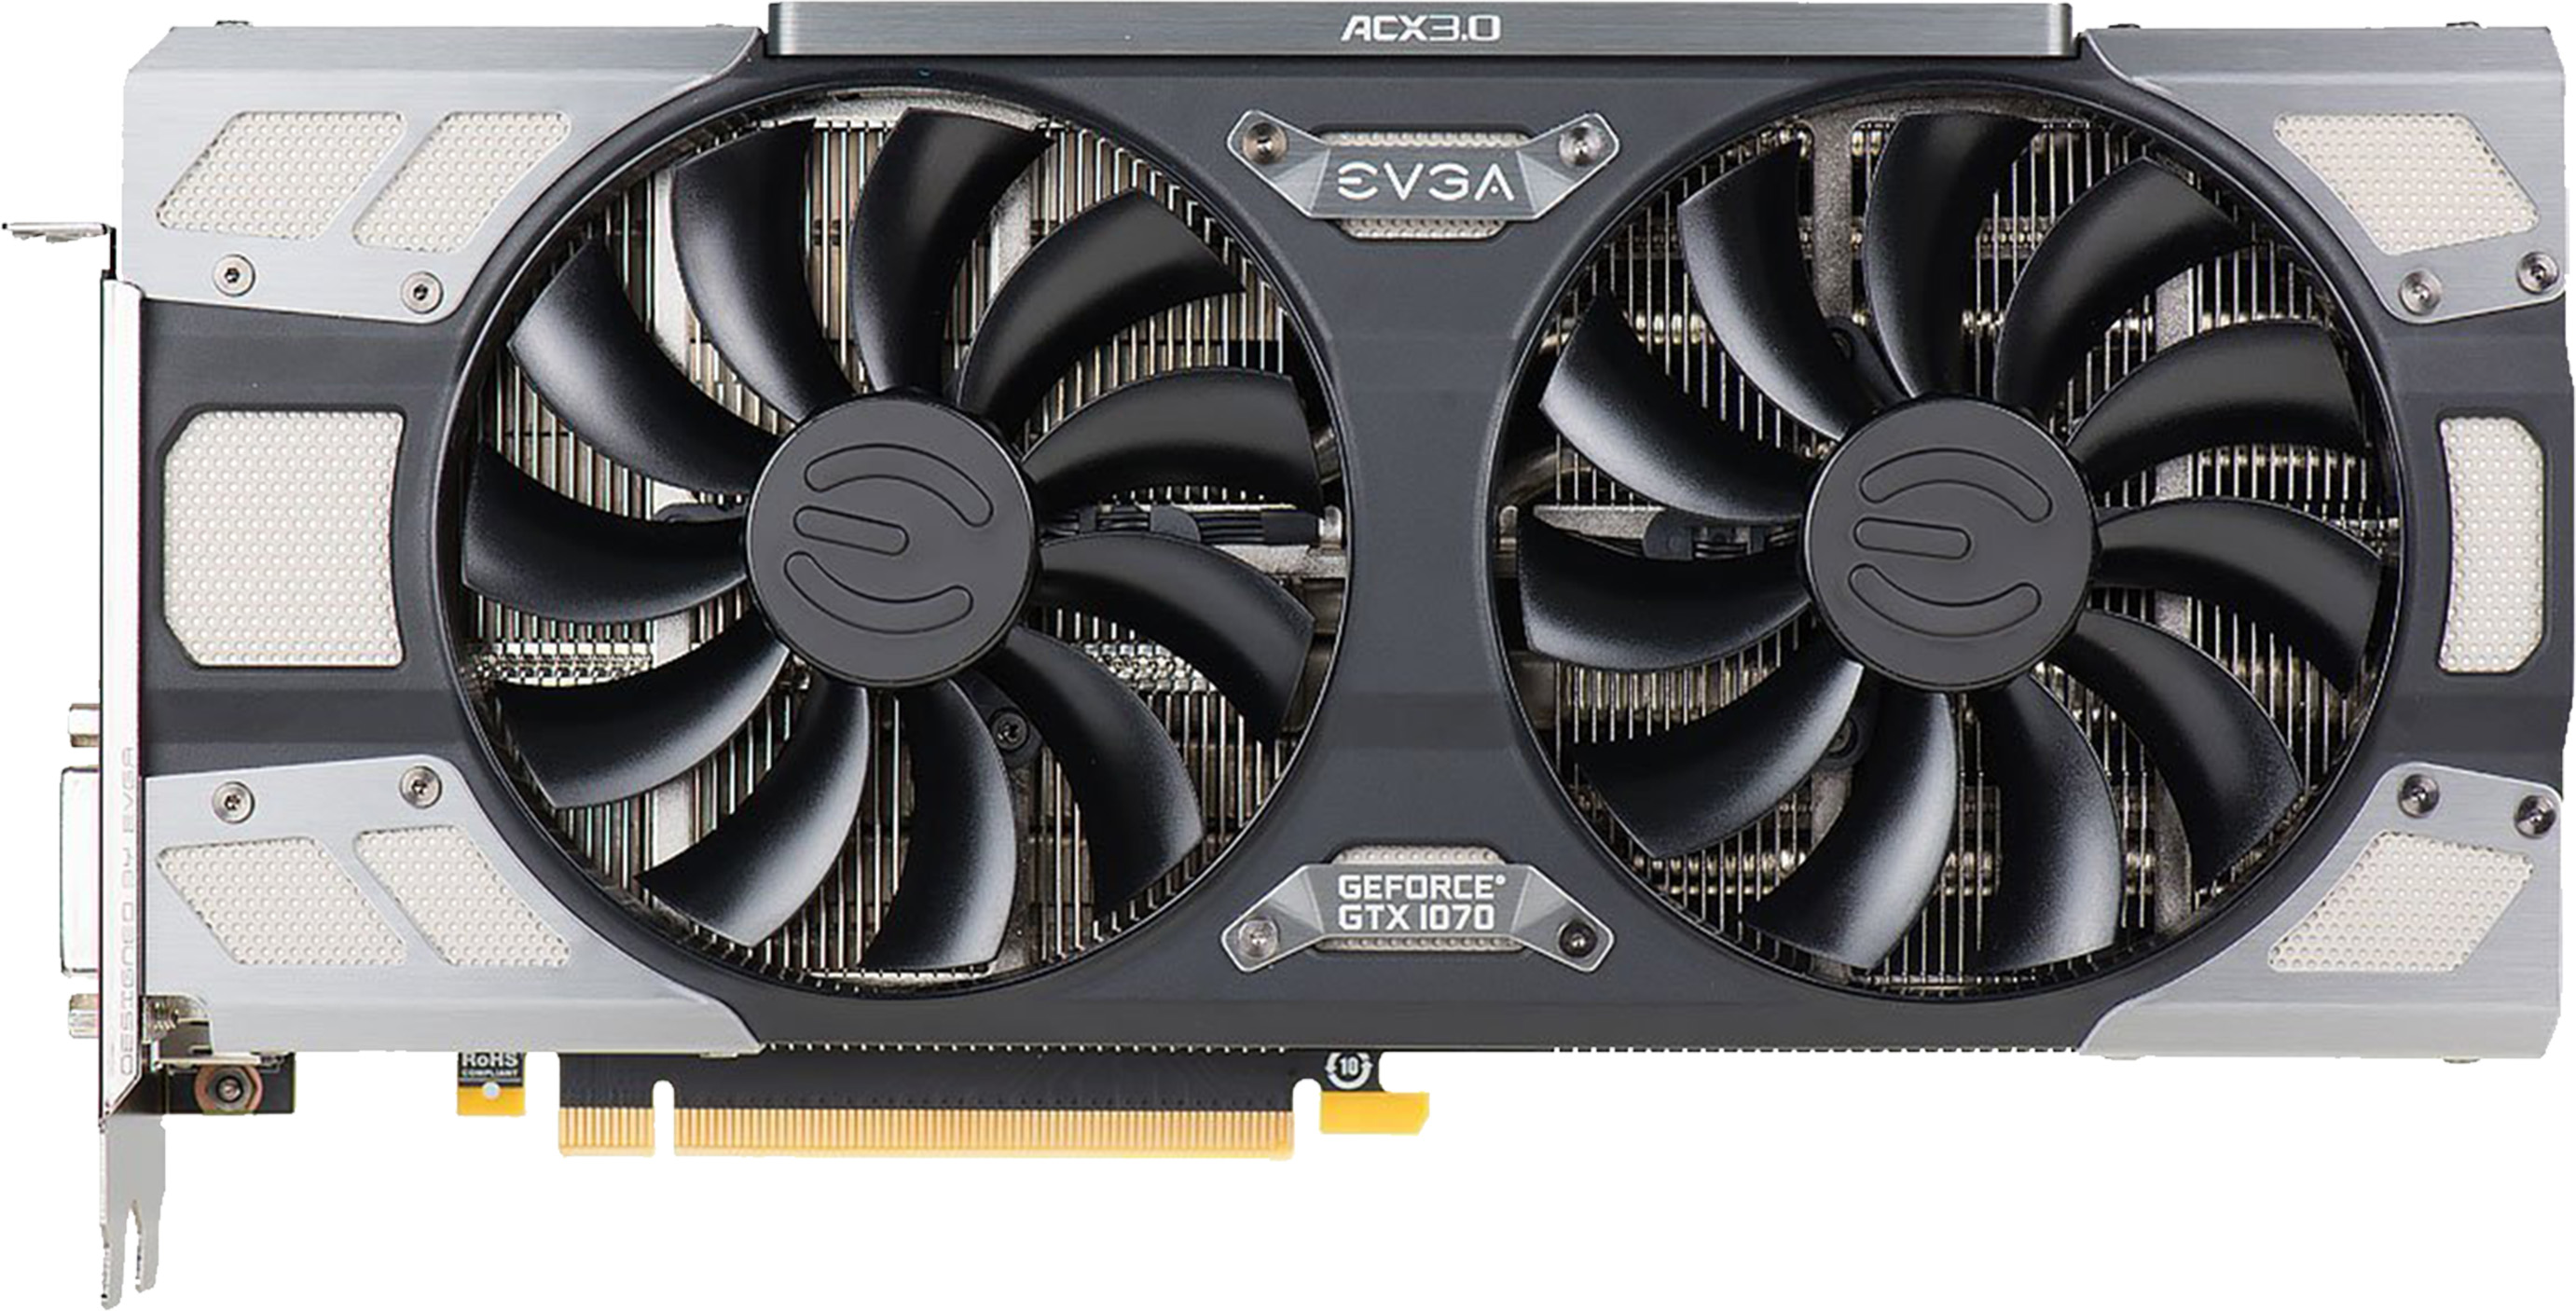 EVGA GeForce GTX 1070 FTW Gaming ACX 3.0 8GB Graphics Card